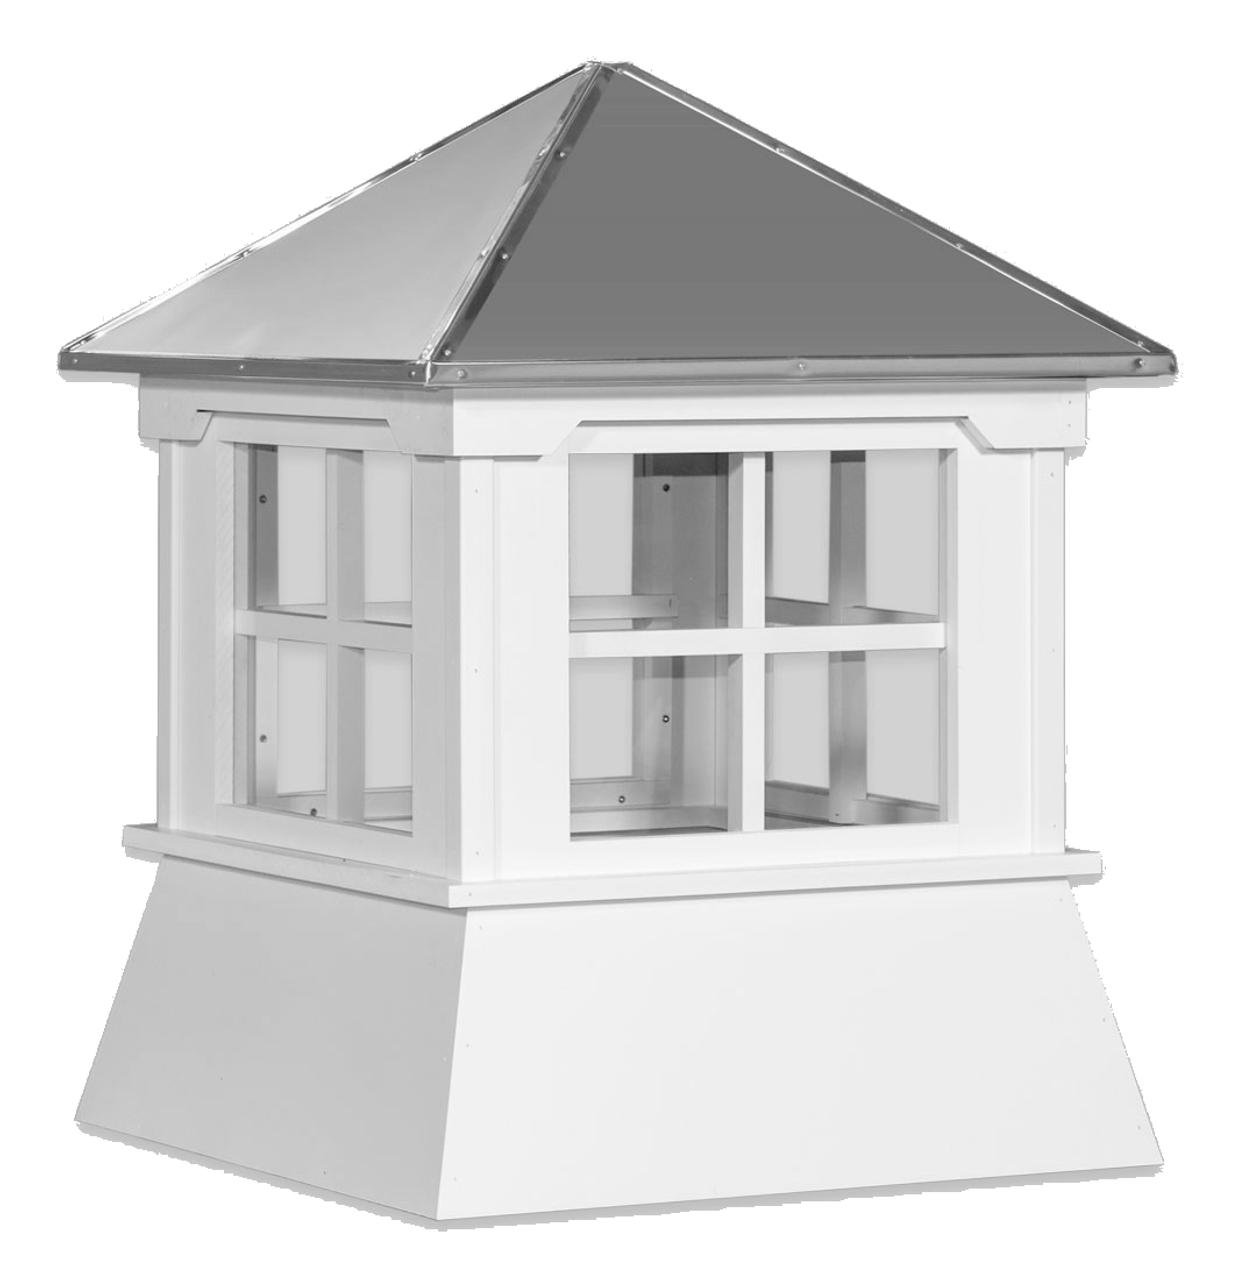 Cupola - Manor Shed: Azek – Windowed Metal Top - 30Lx30Wx36H